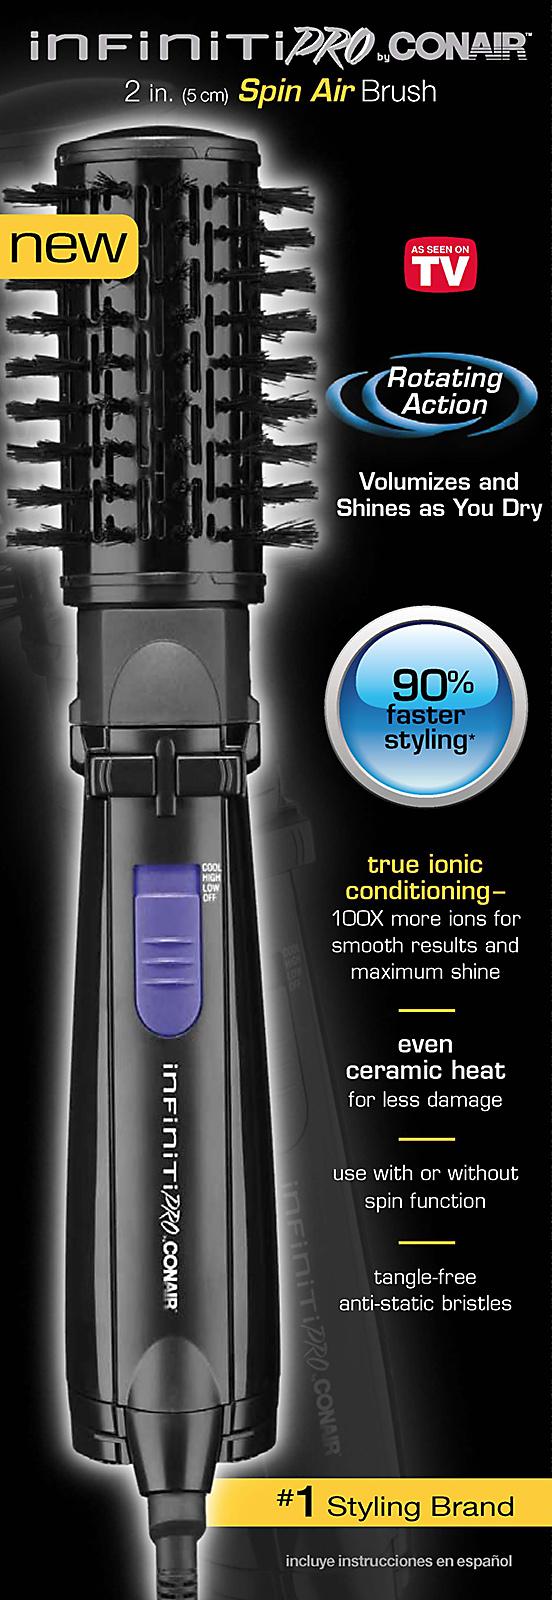 Conair Infiniti Pro Spin Air Rotating Styler